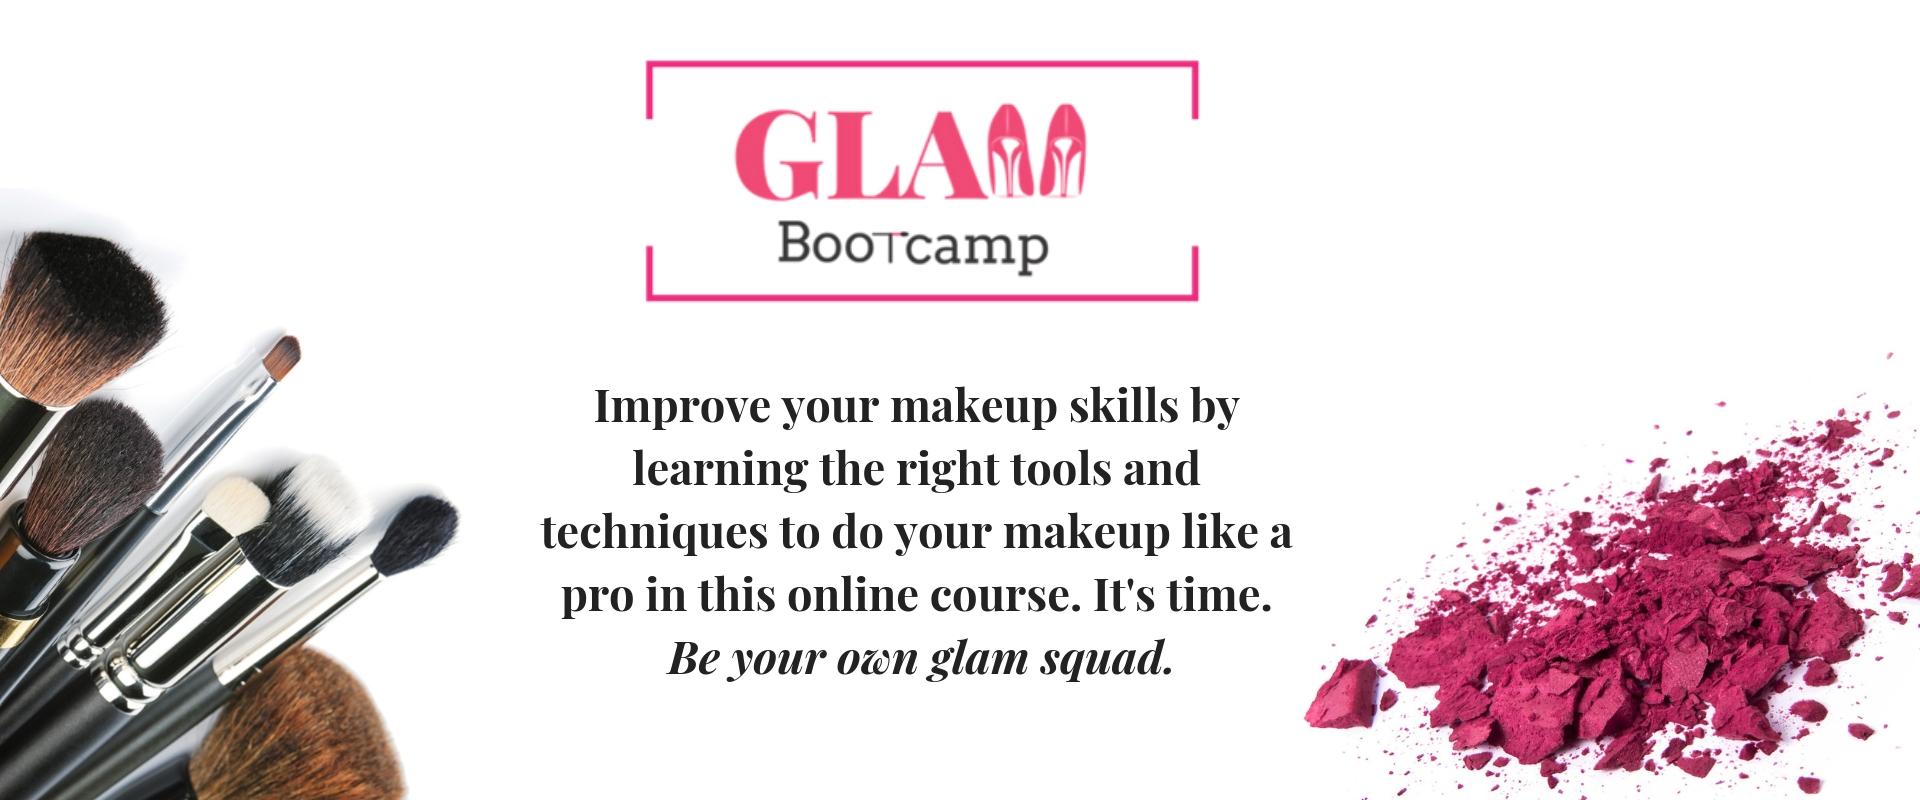 Glam Bootcamp